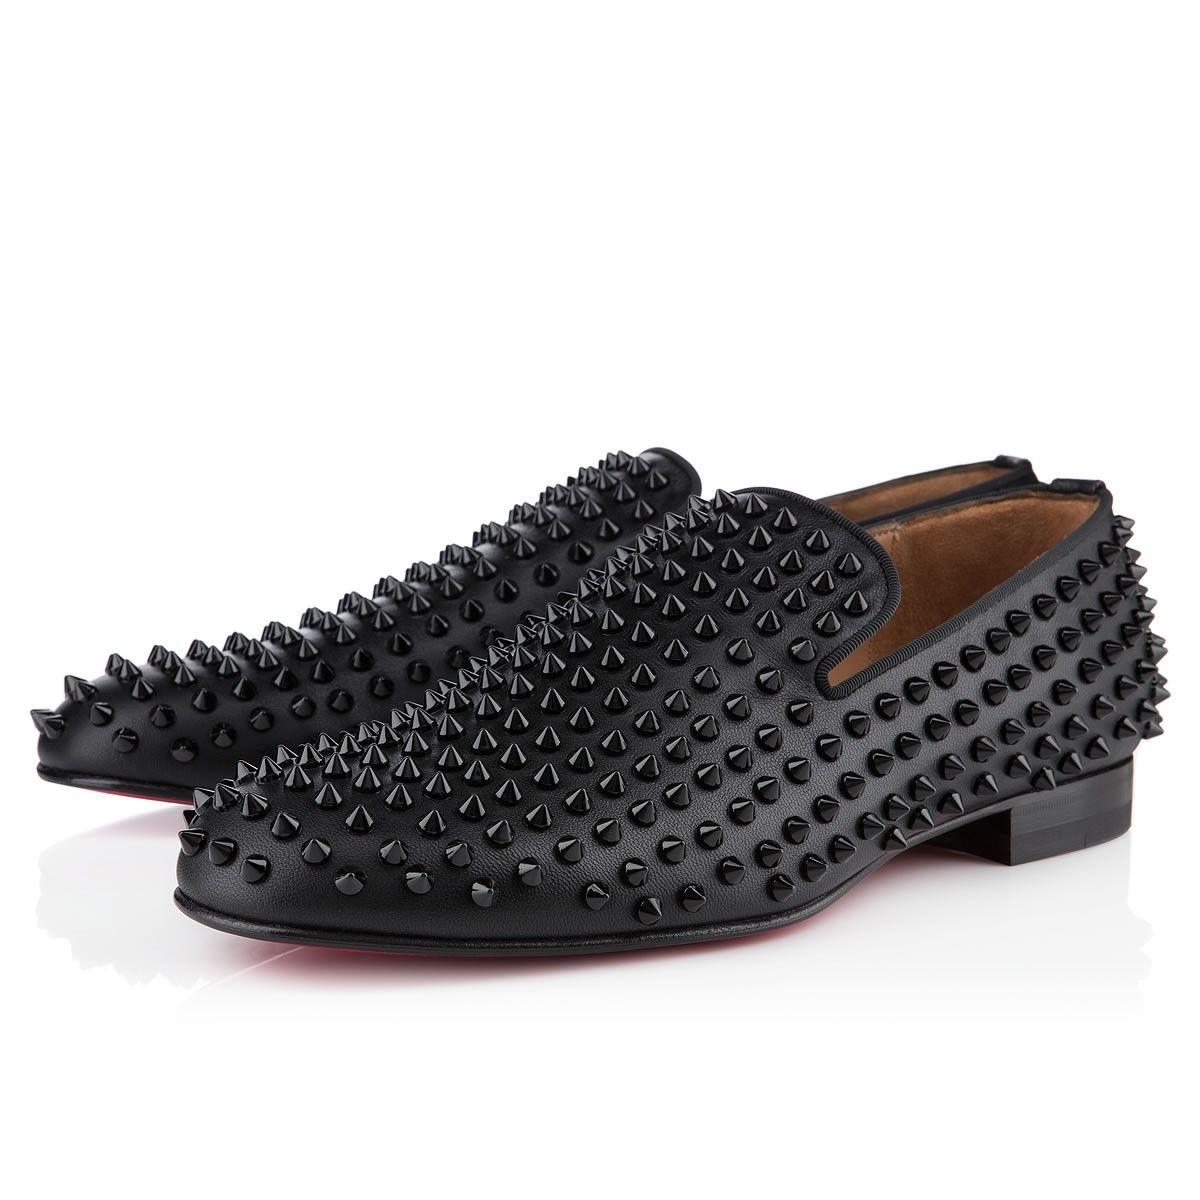 rollerboy spikes nappa noir noir souliers pour homme. Black Bedroom Furniture Sets. Home Design Ideas